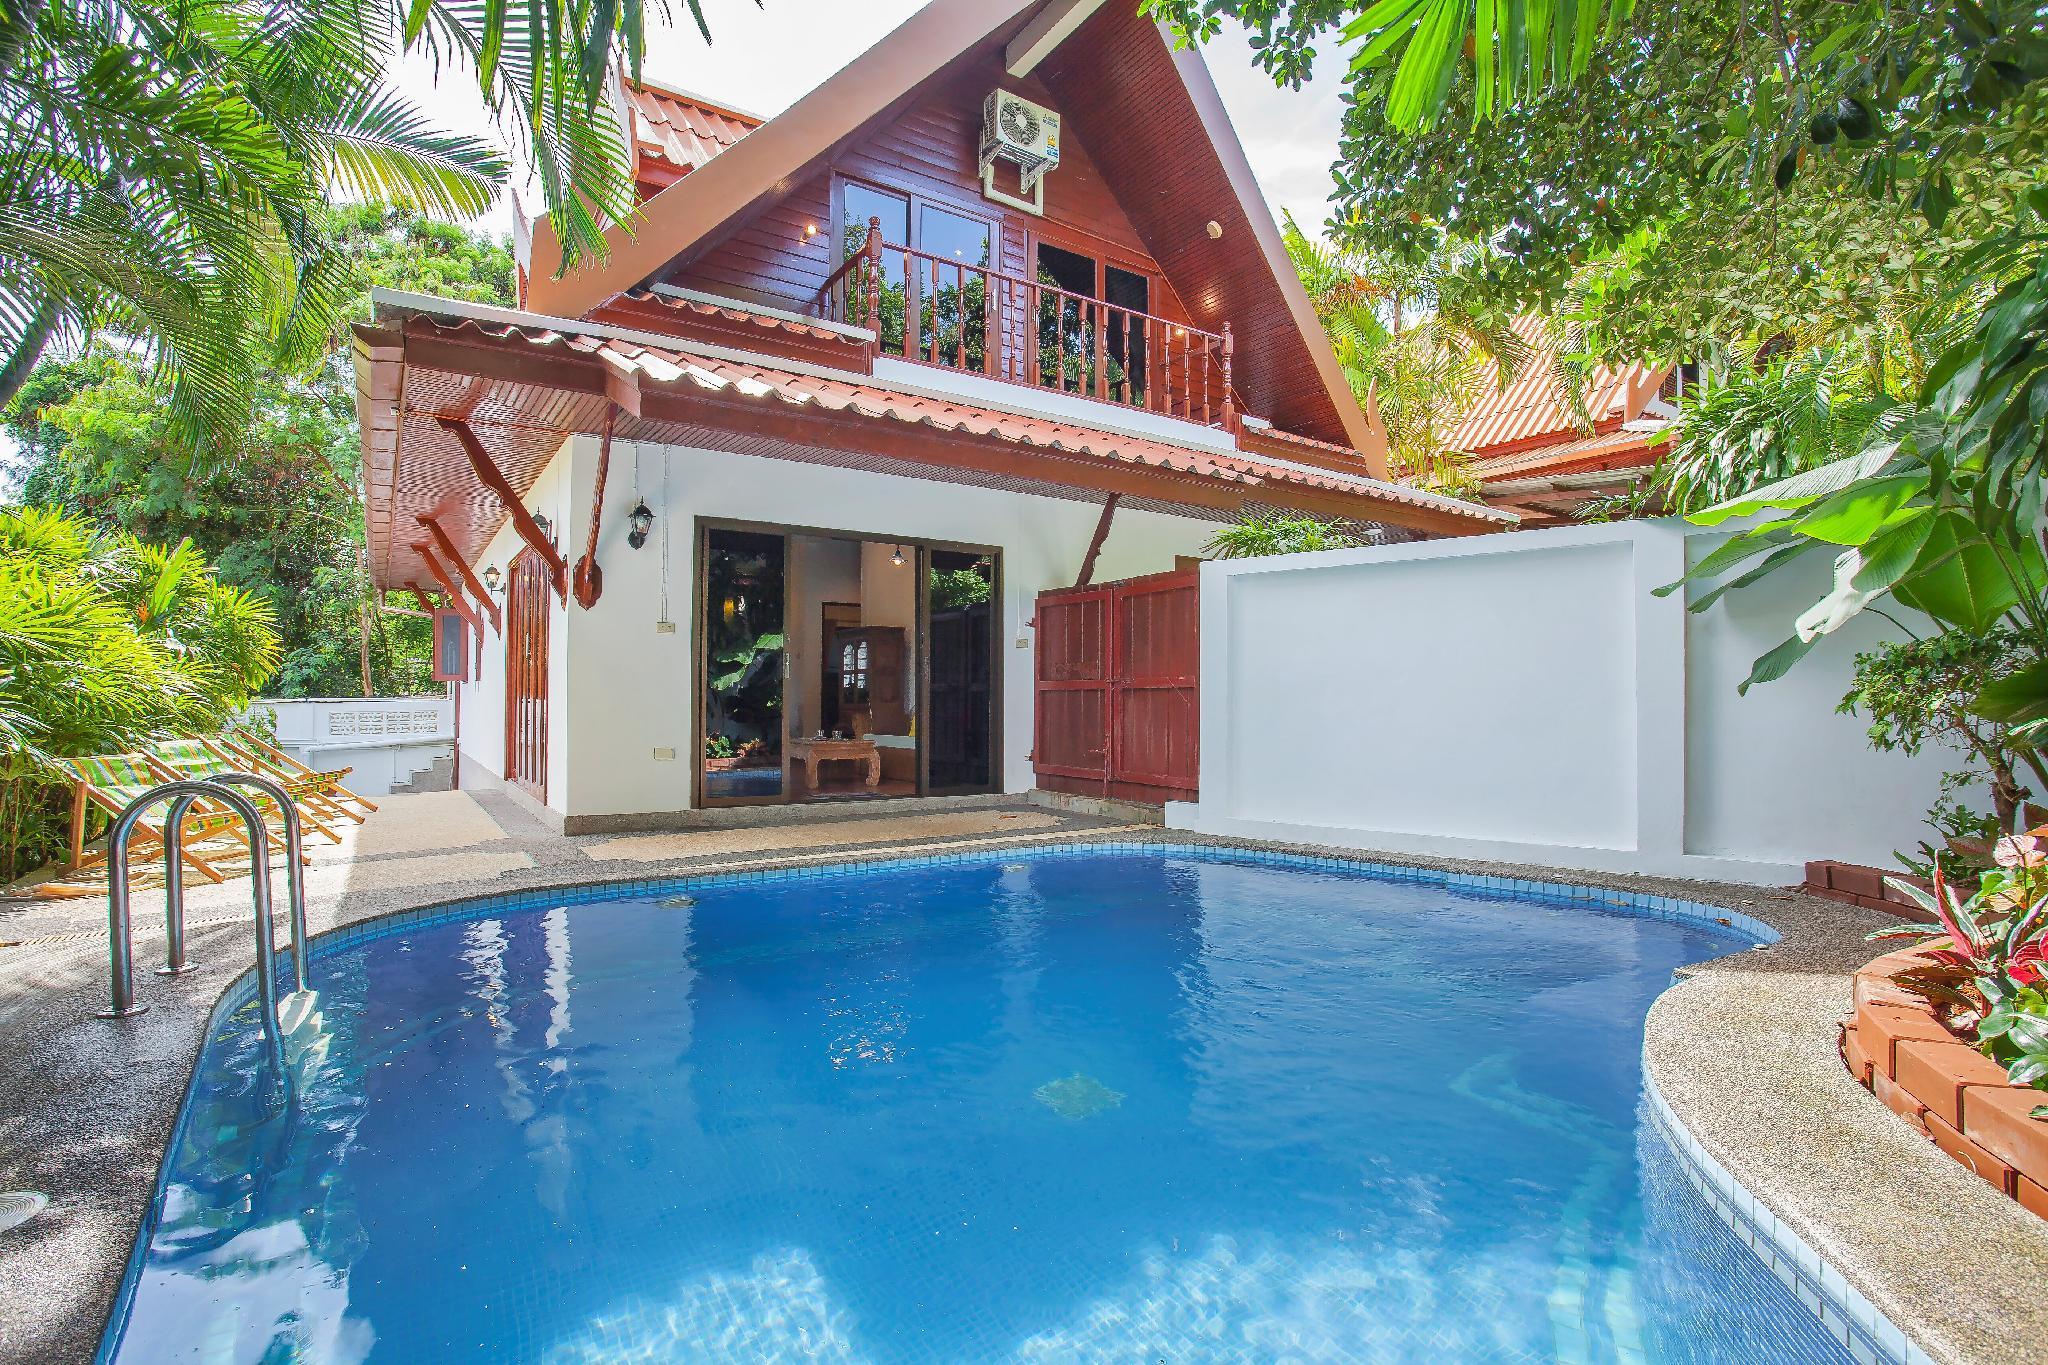 Villa Nikkie Classic Thai Pool Villa 500m To Beach